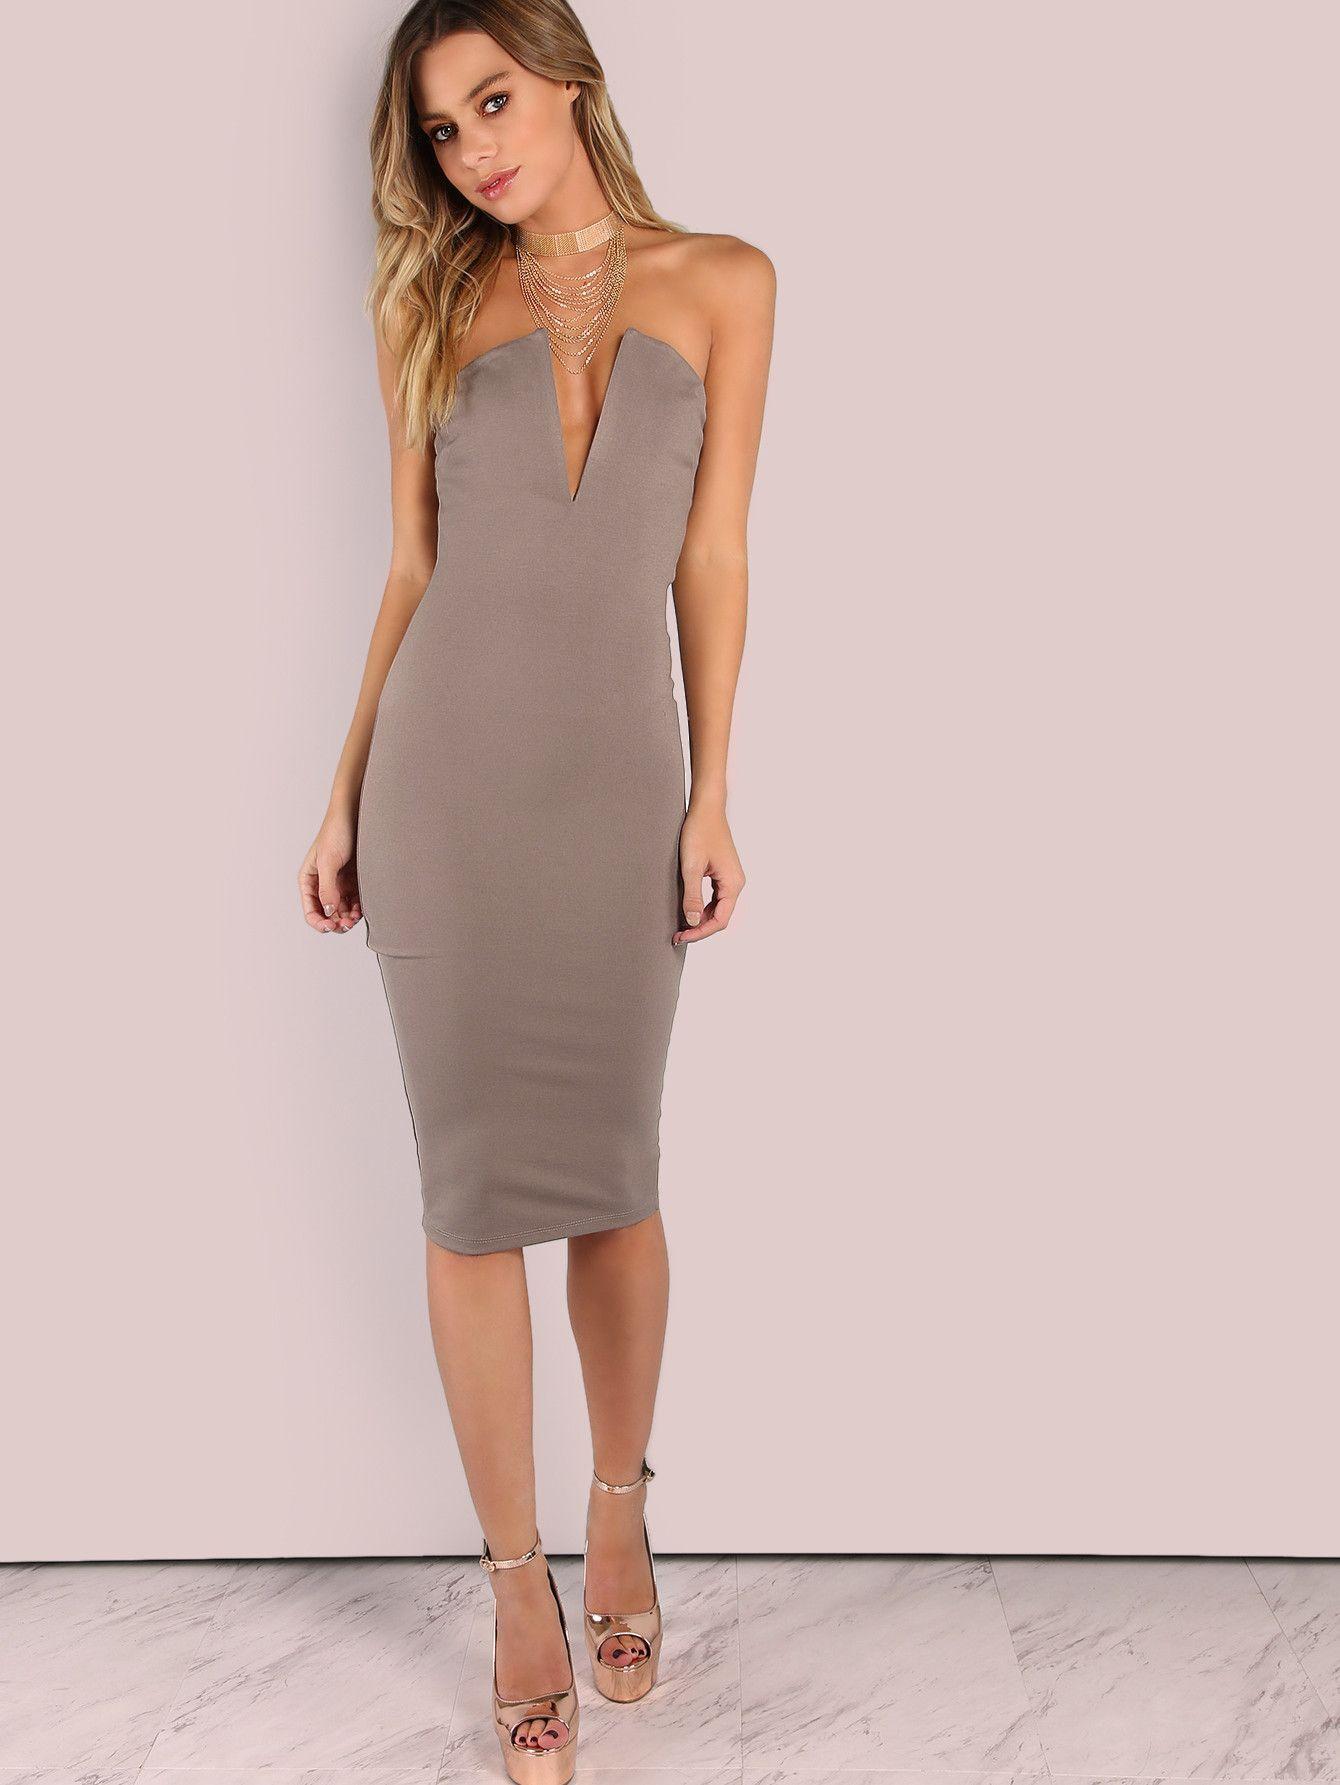 eb7e8e5940 Fabric  Fabric has some stretch Season  Spring Type  Tube Pattern Type   Plain Sleeve Length  Sleeveless Color  Grey Dresses Length  Midi Style   Elegant ...